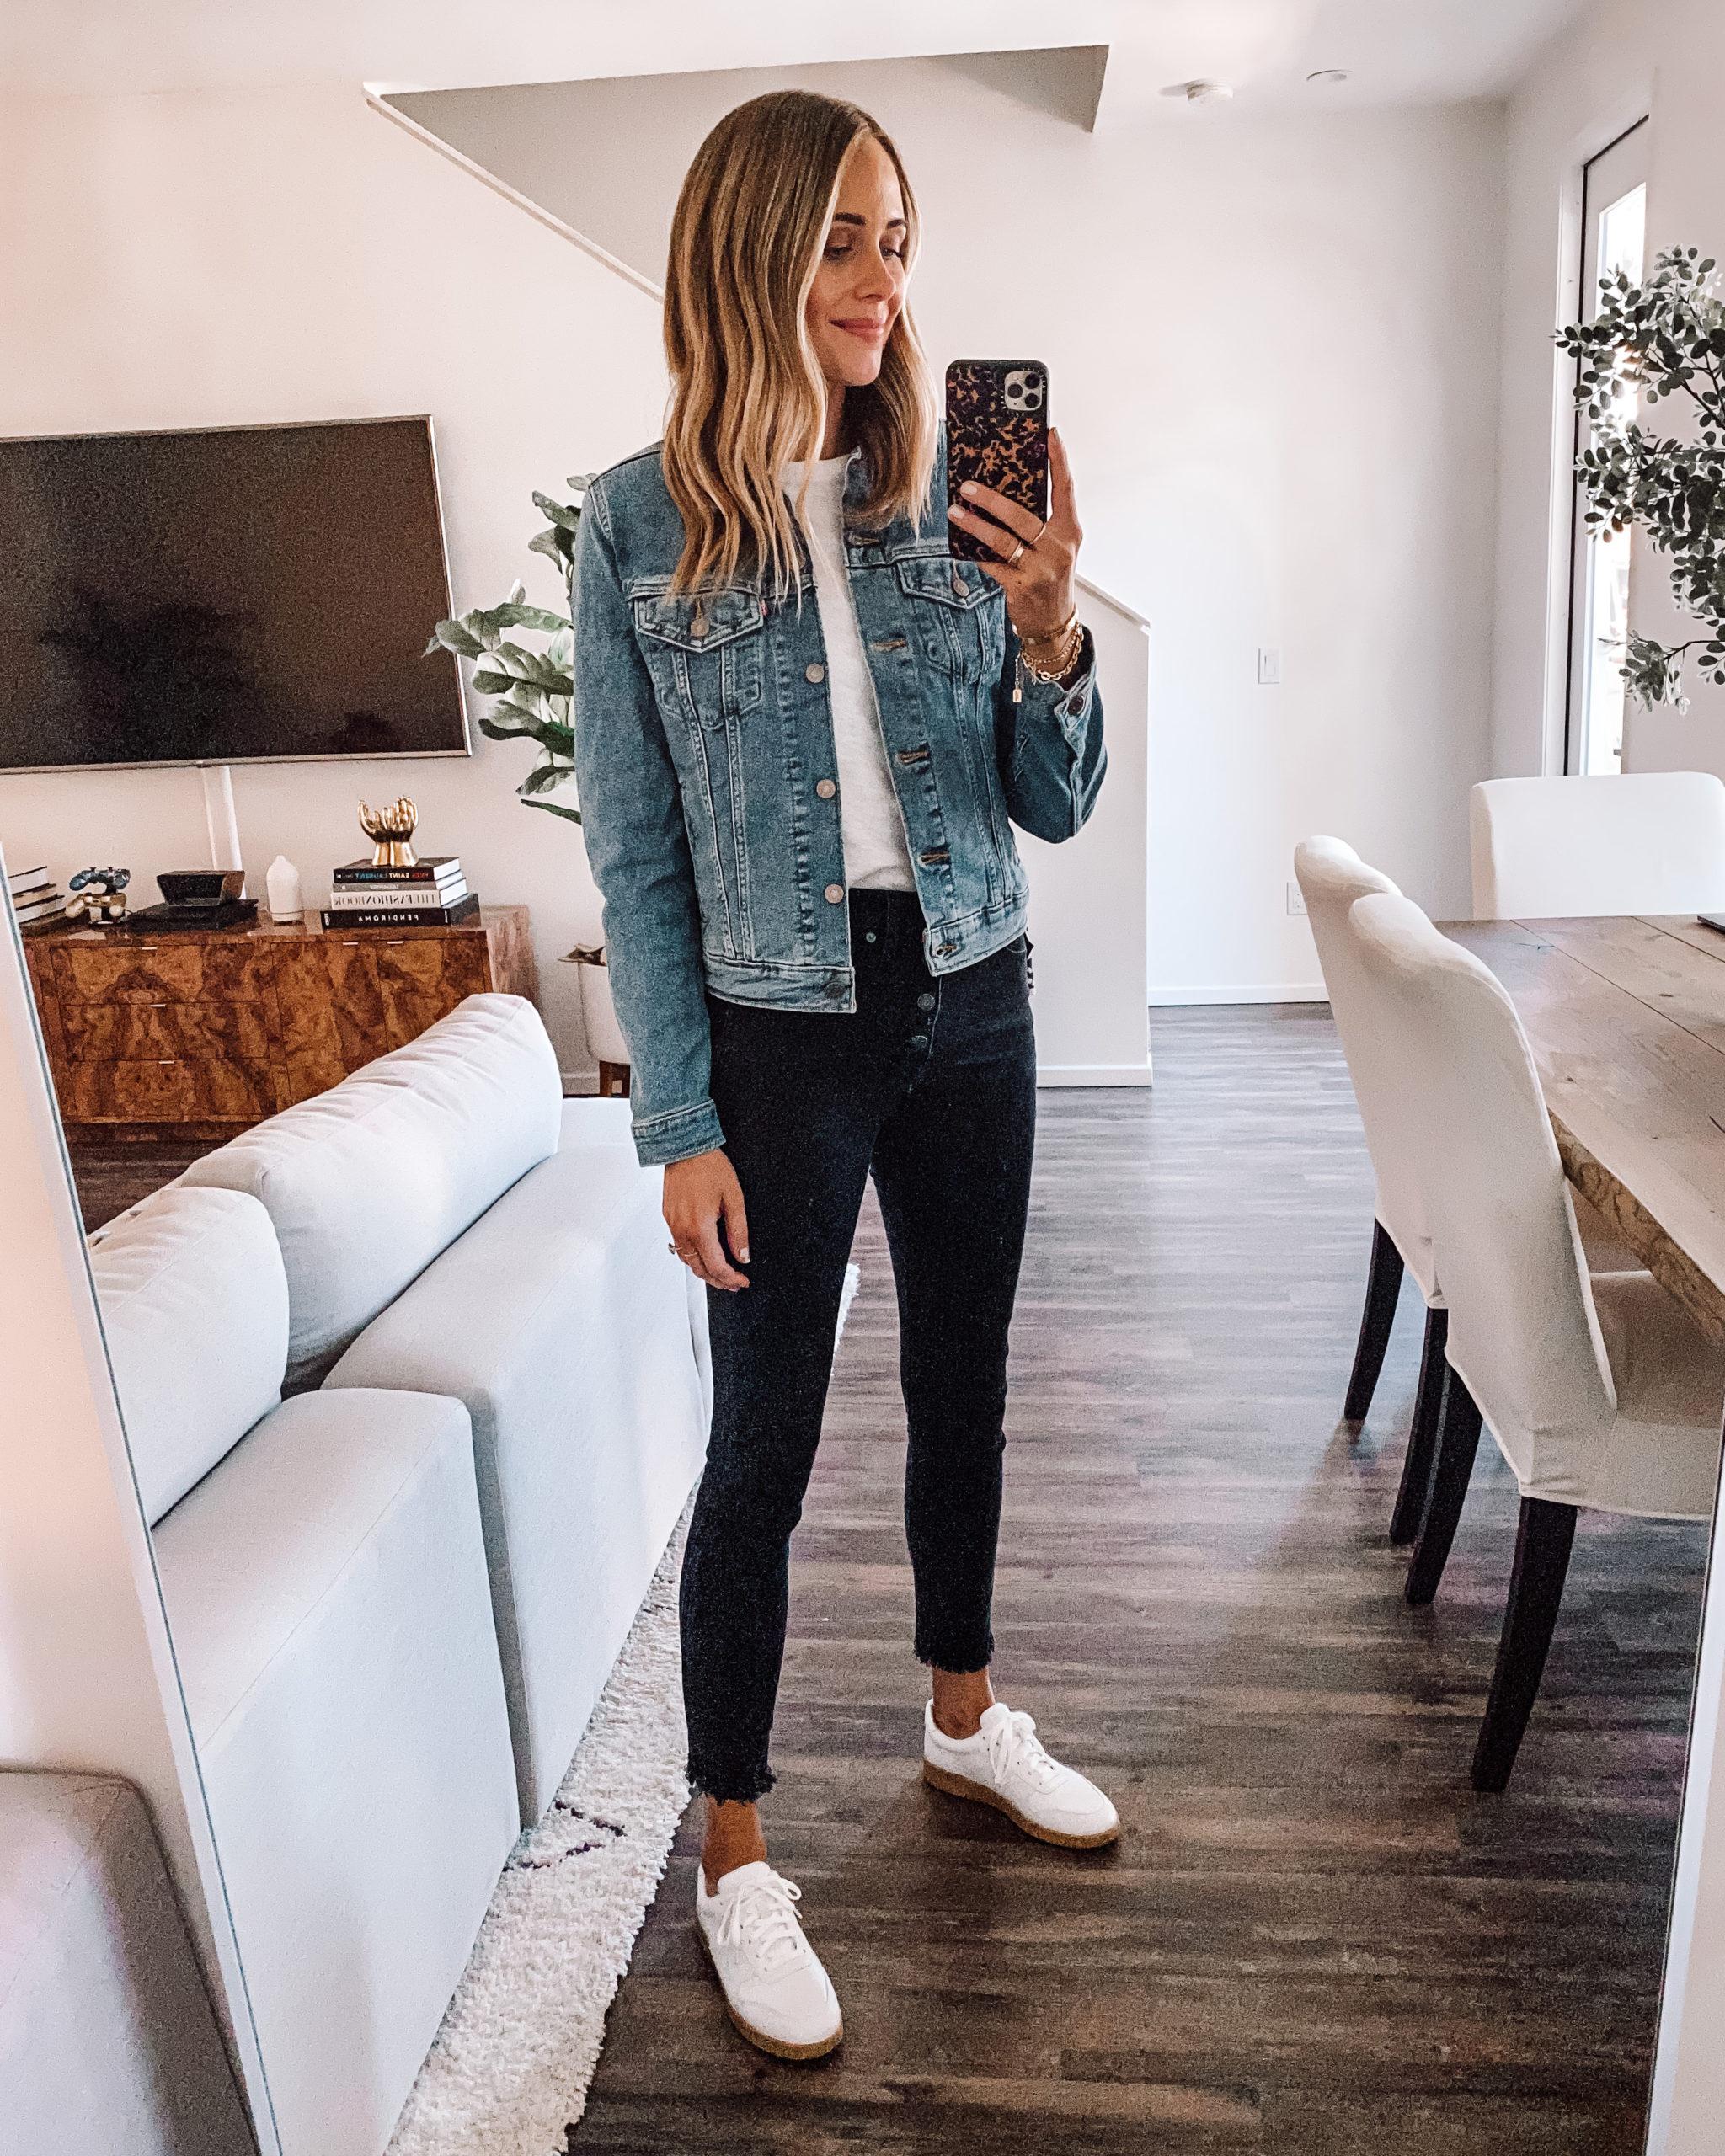 Fashion Jackson Wearing Levis Original Trucker Jacket White Tshirt Black Skinny Jeans Everlane White Sneakers